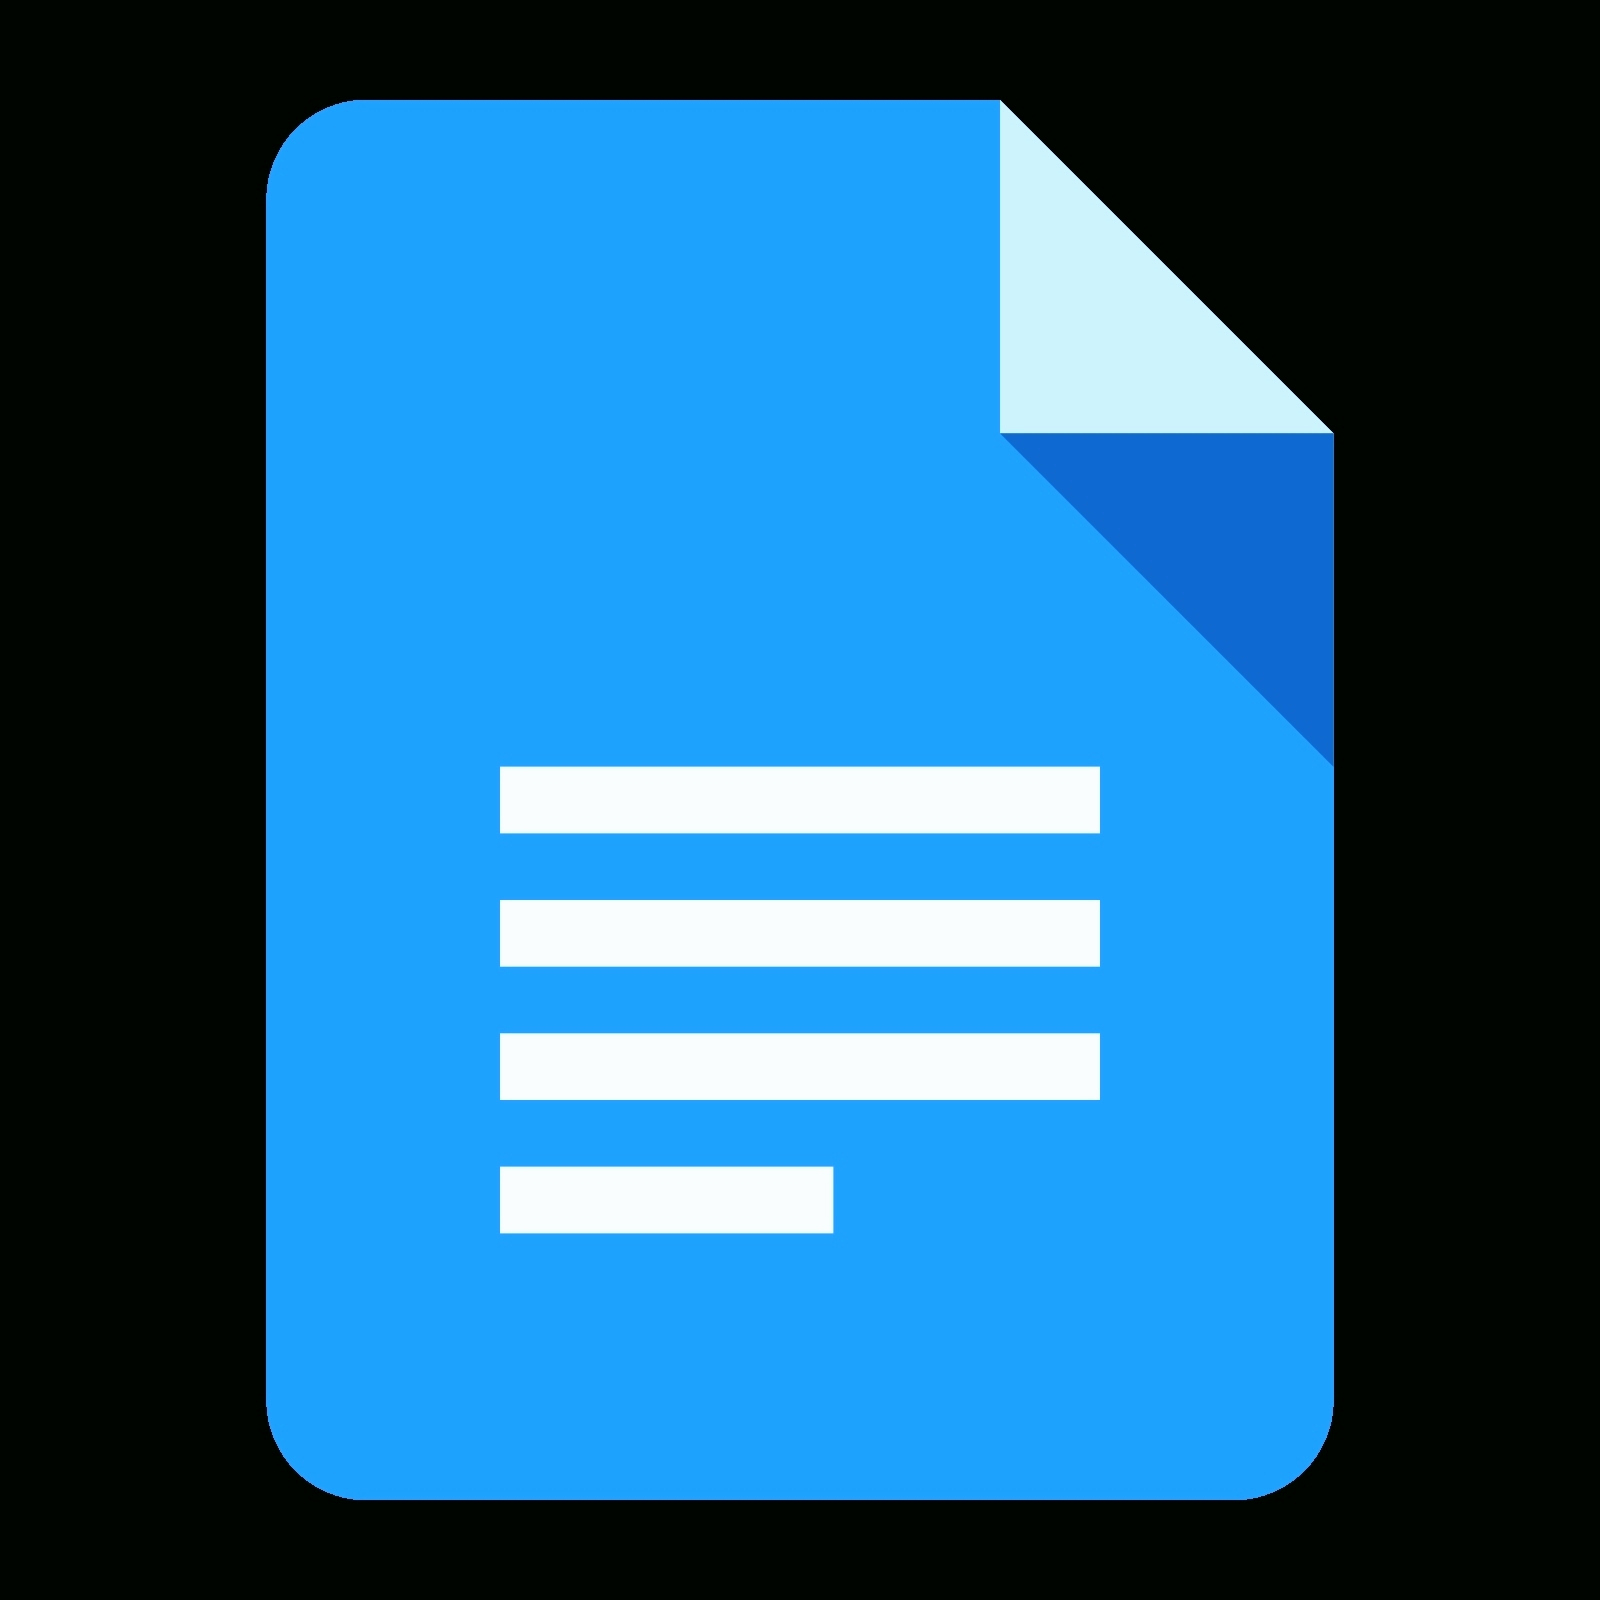 1600x1600 Google Spreadsheet Icon Fresh Google Docs Icon Unique Document